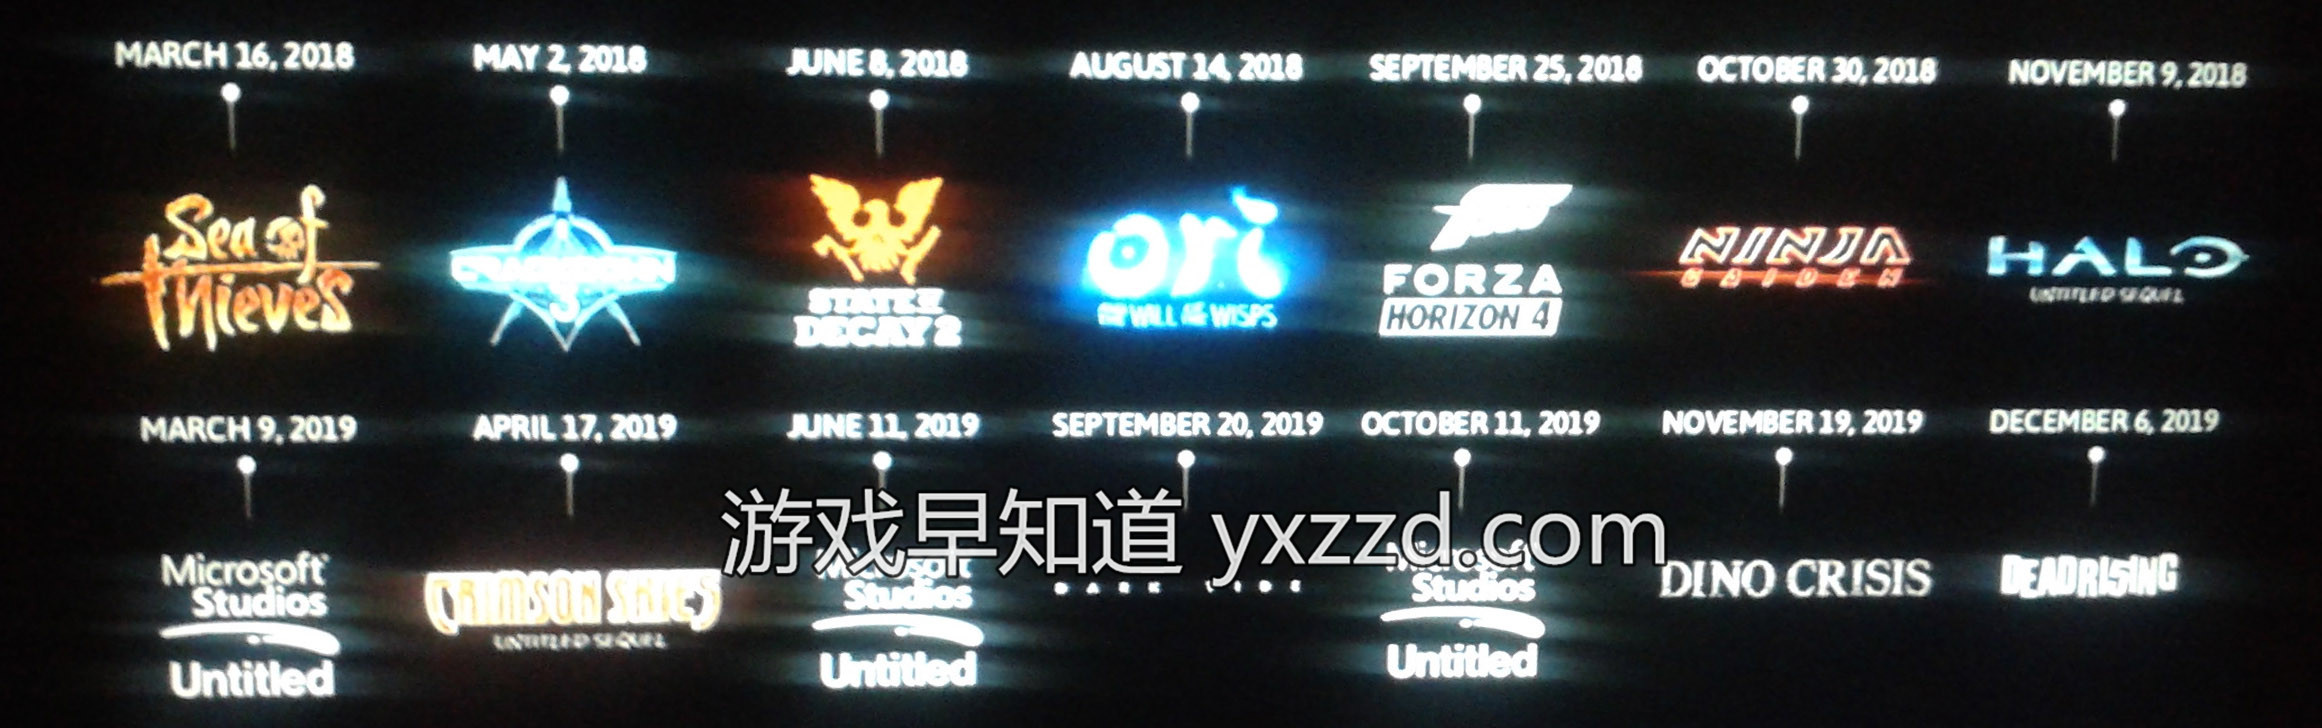 XboxOne新作路线图